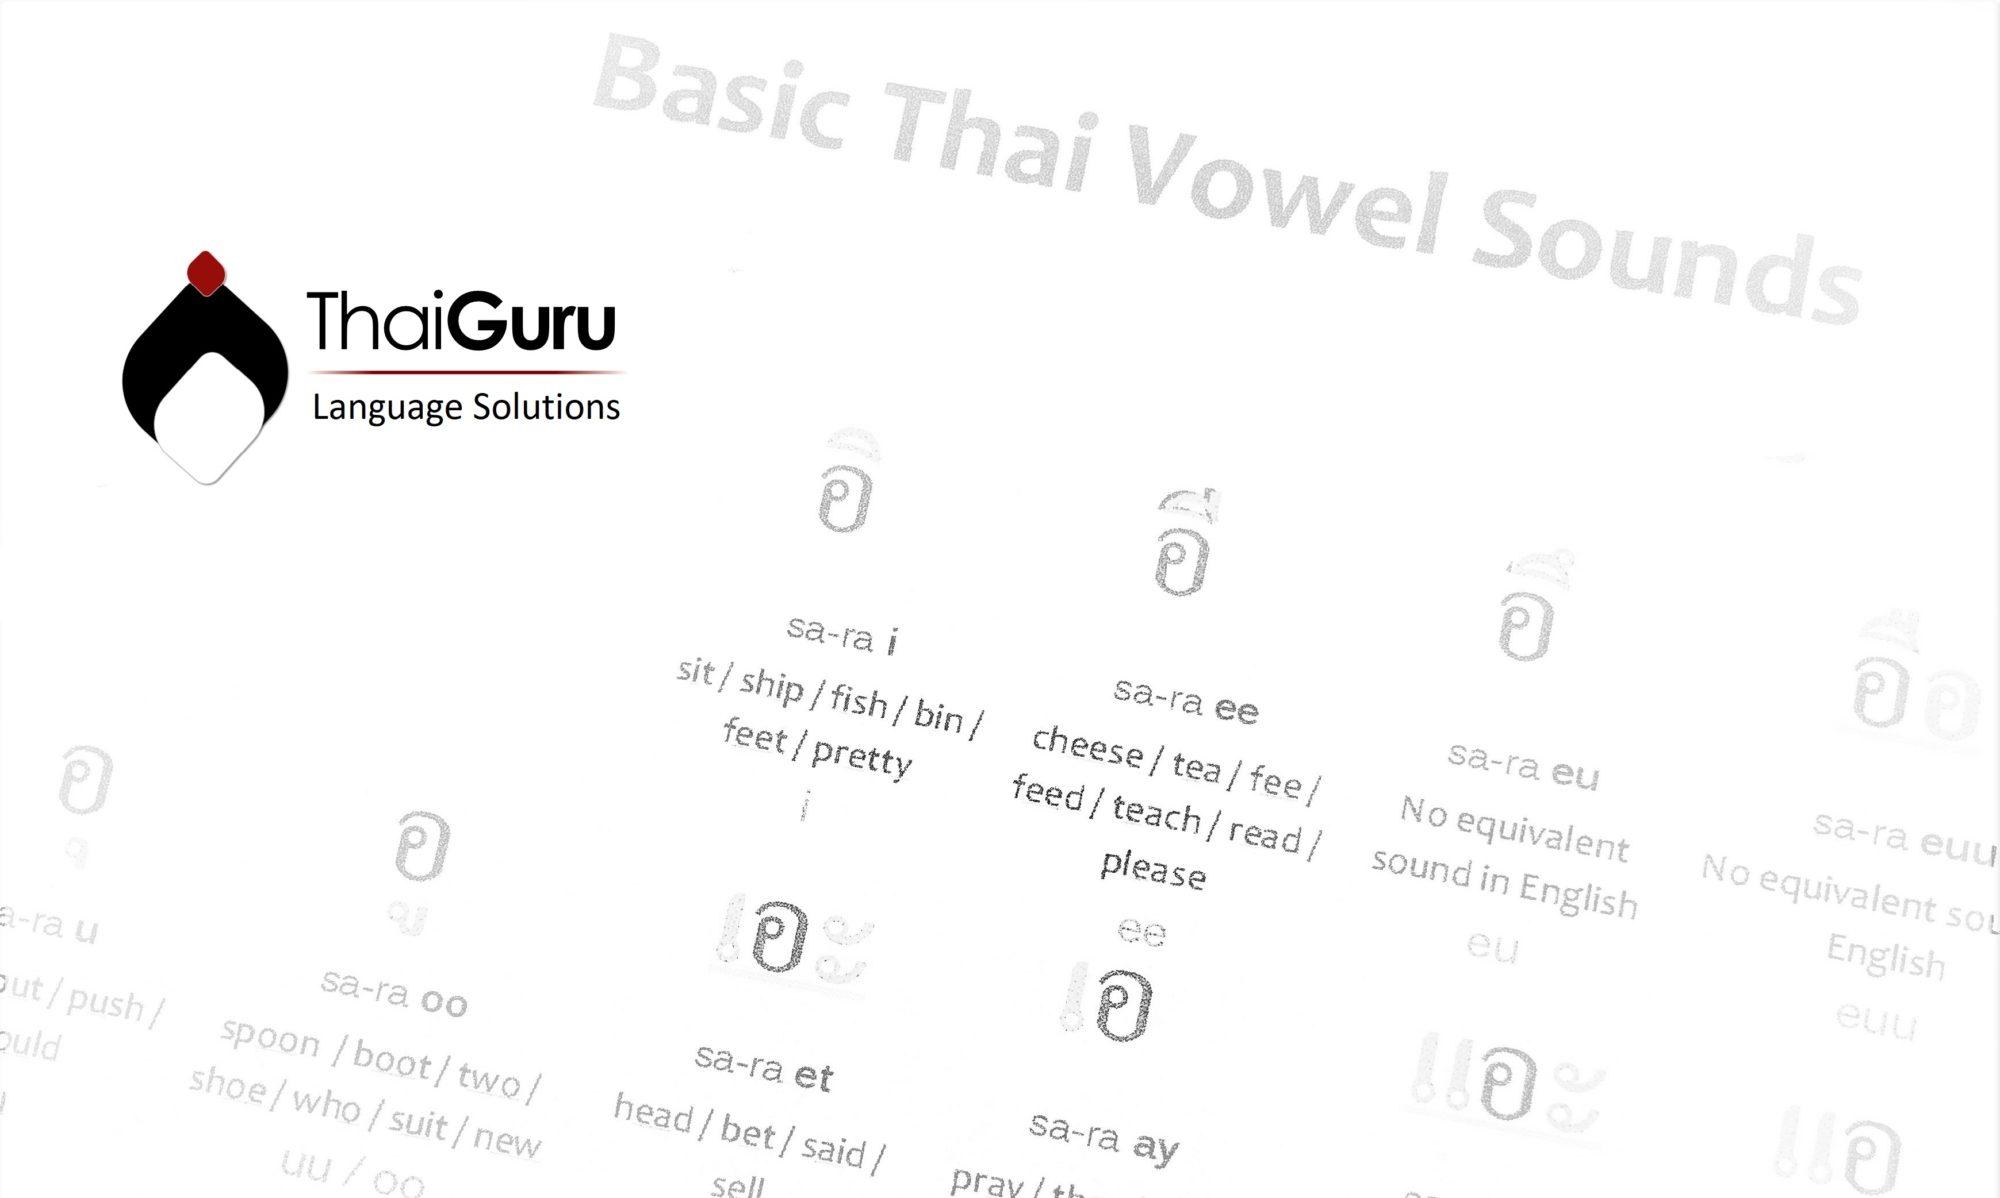 ThaiGuru language solutions